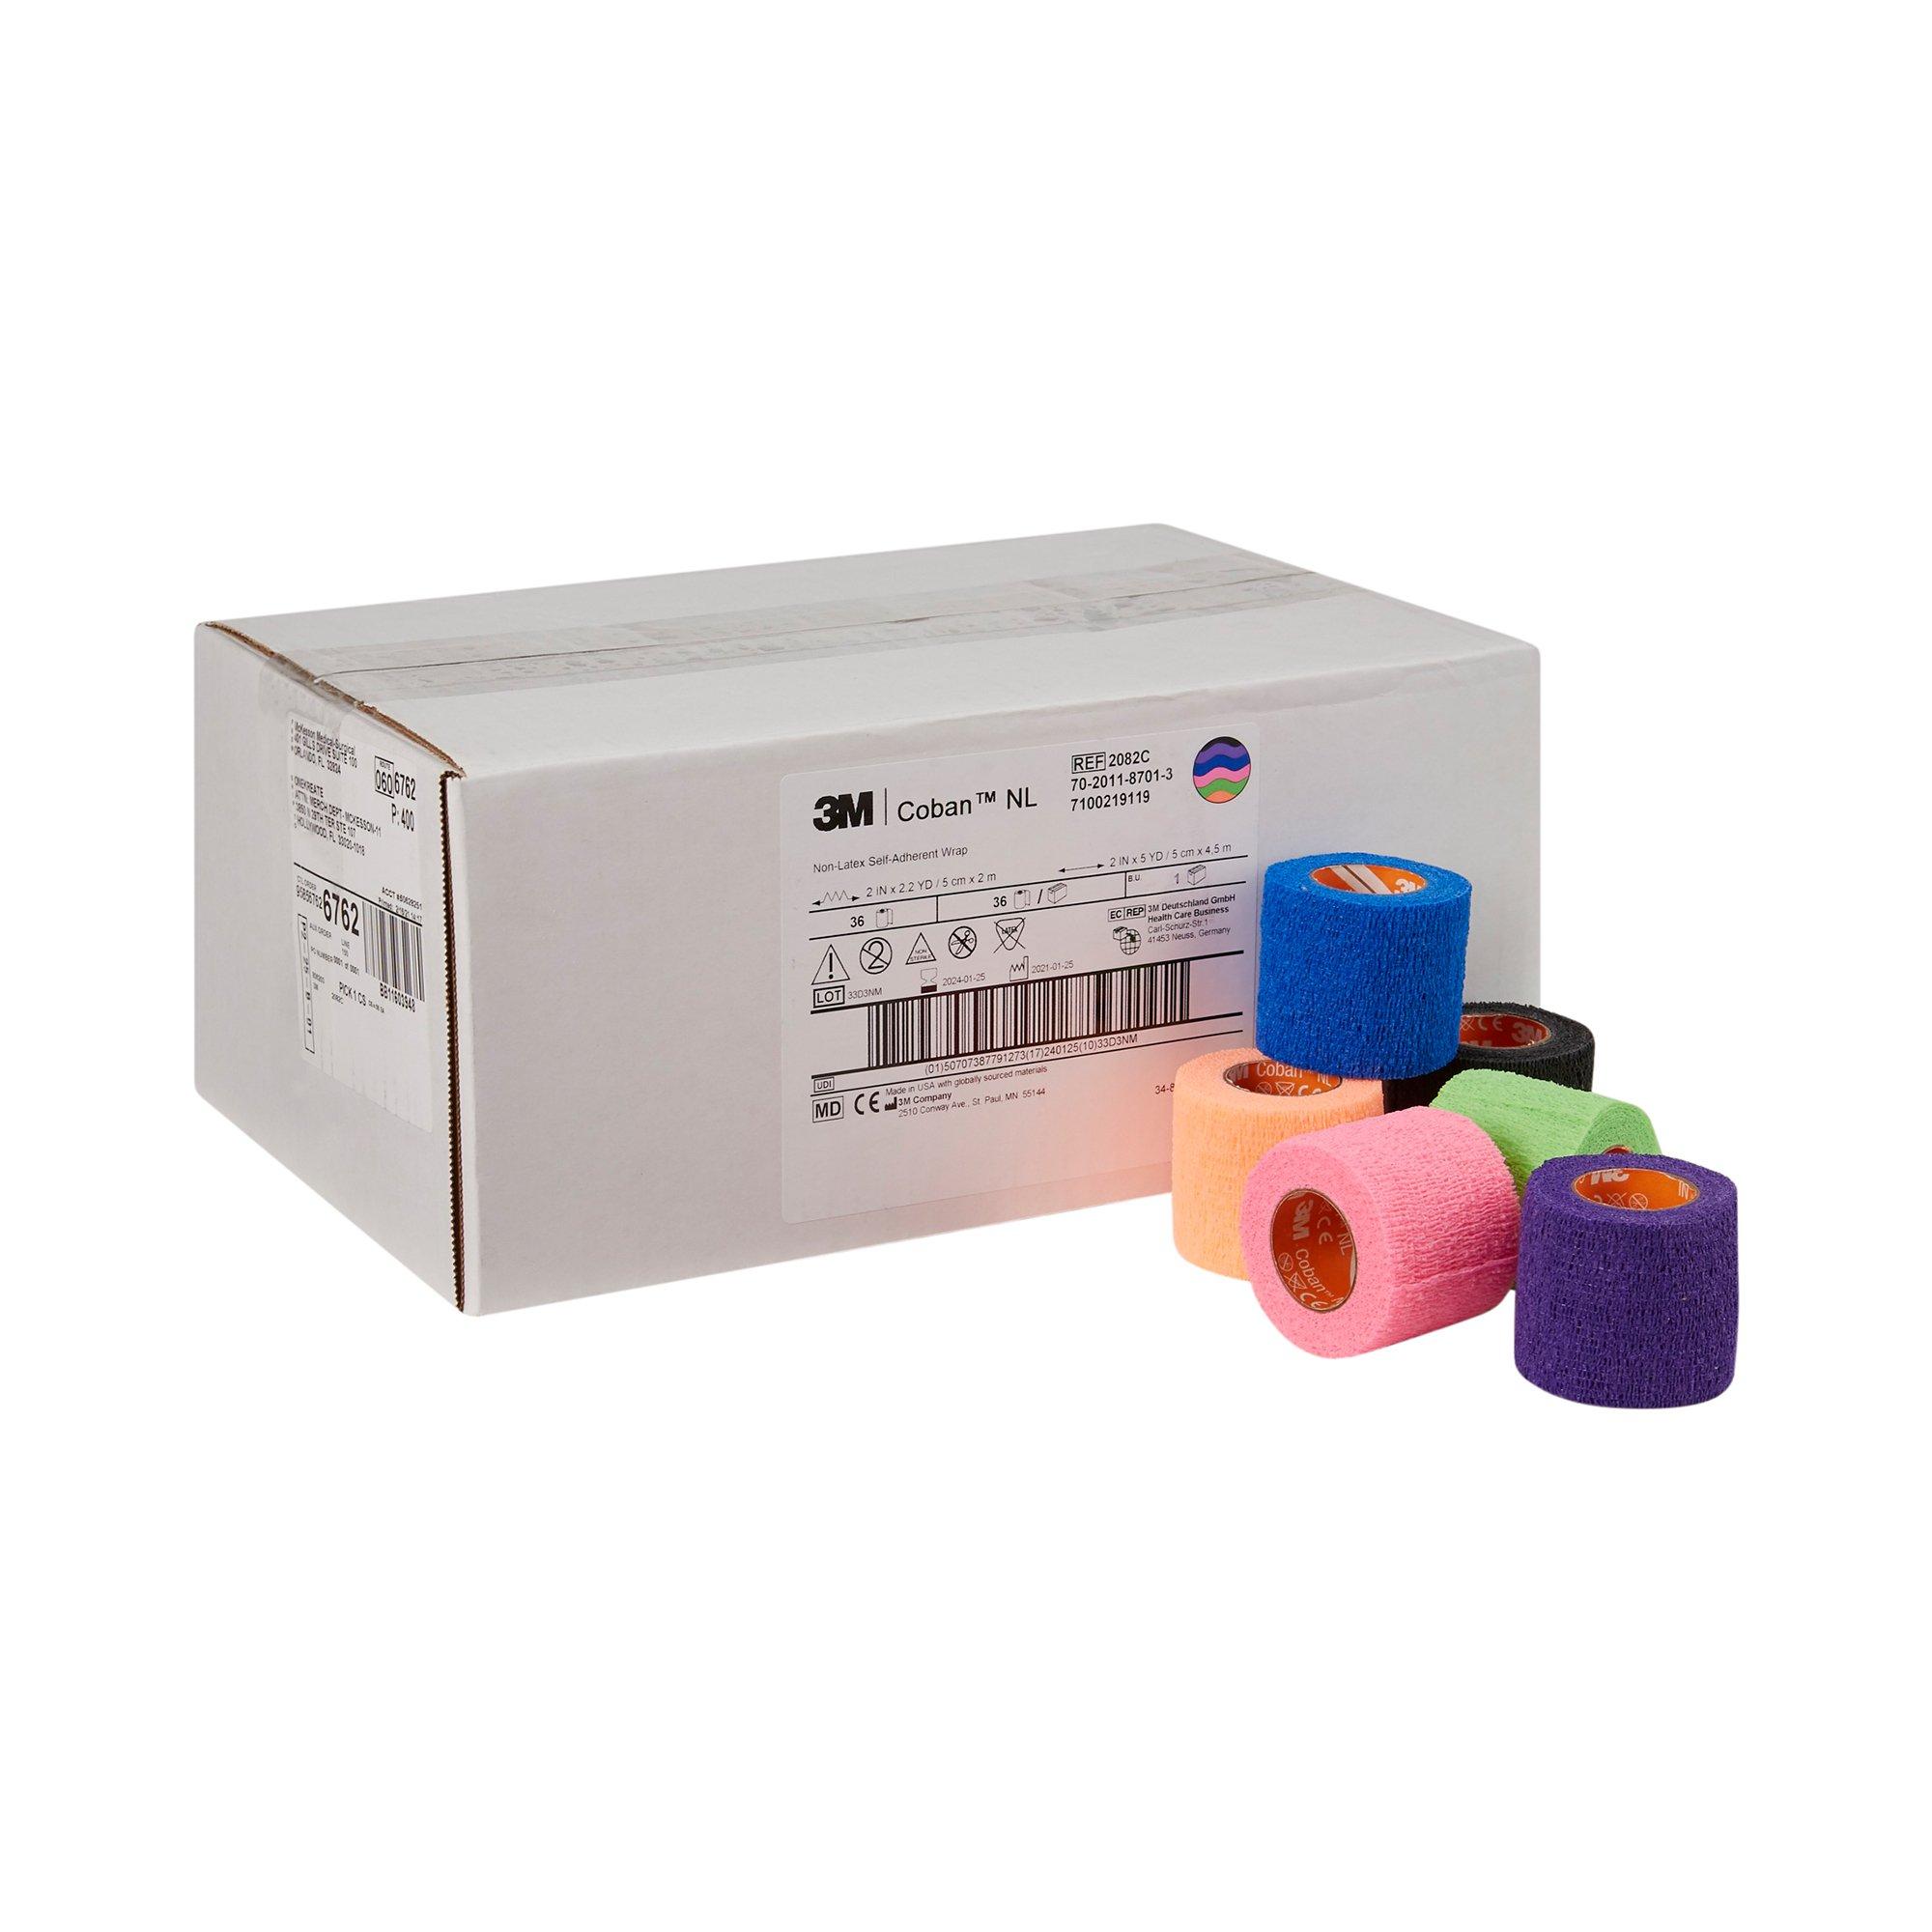 "3M Coban Compression Cohesive Bandage, NonSterile, 2 X 5"" , 2082C, Case of 36"